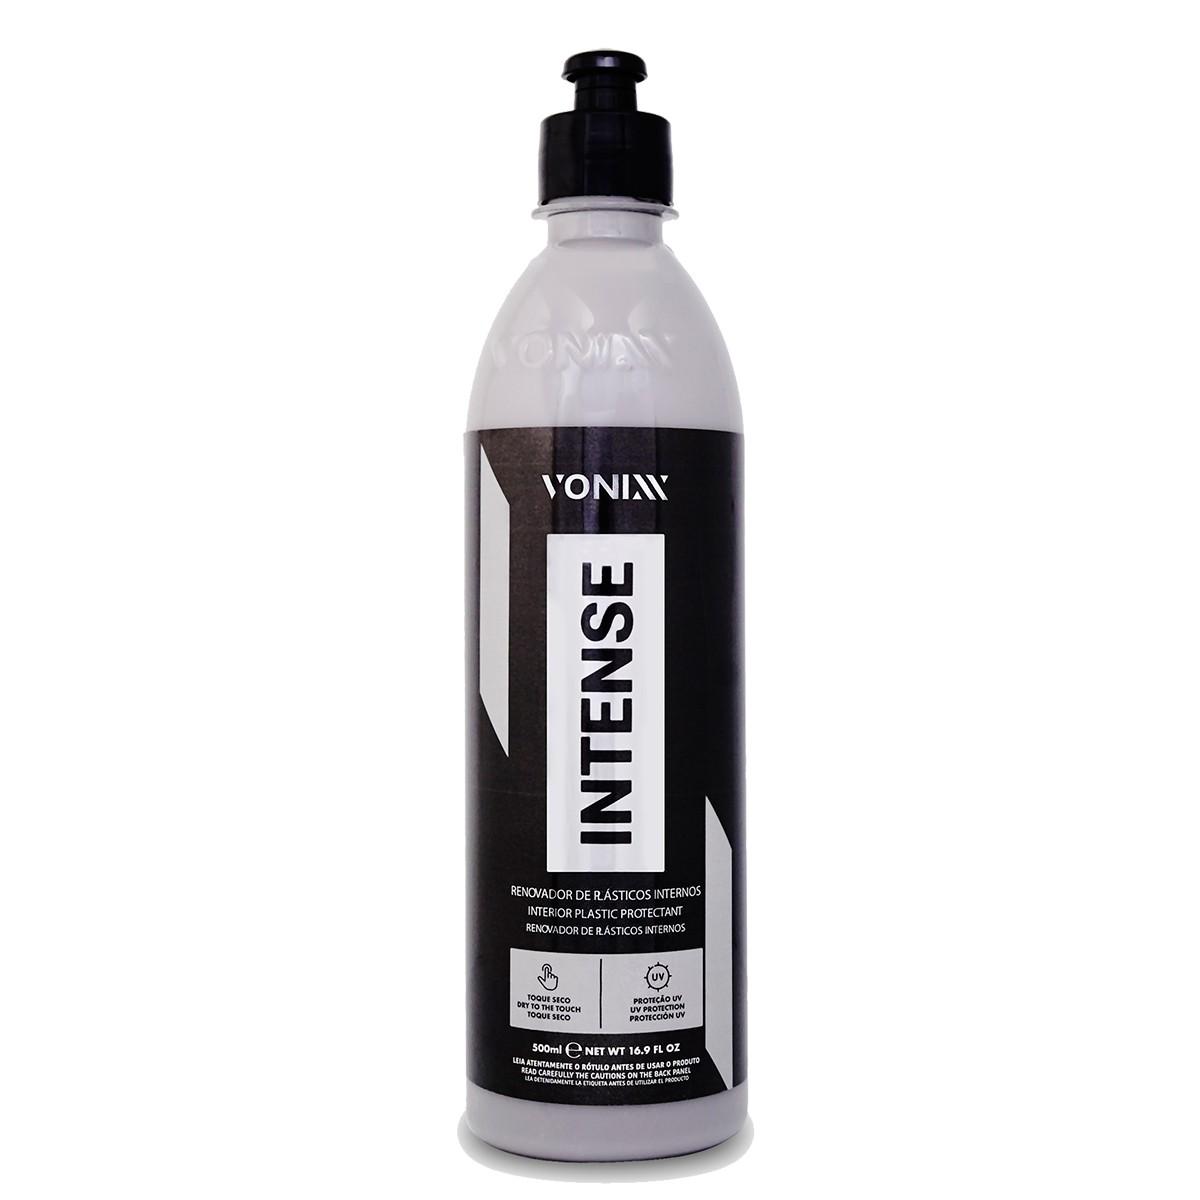 Intense 500ml ( Renovador de Plásticos Internos) - Vonixx